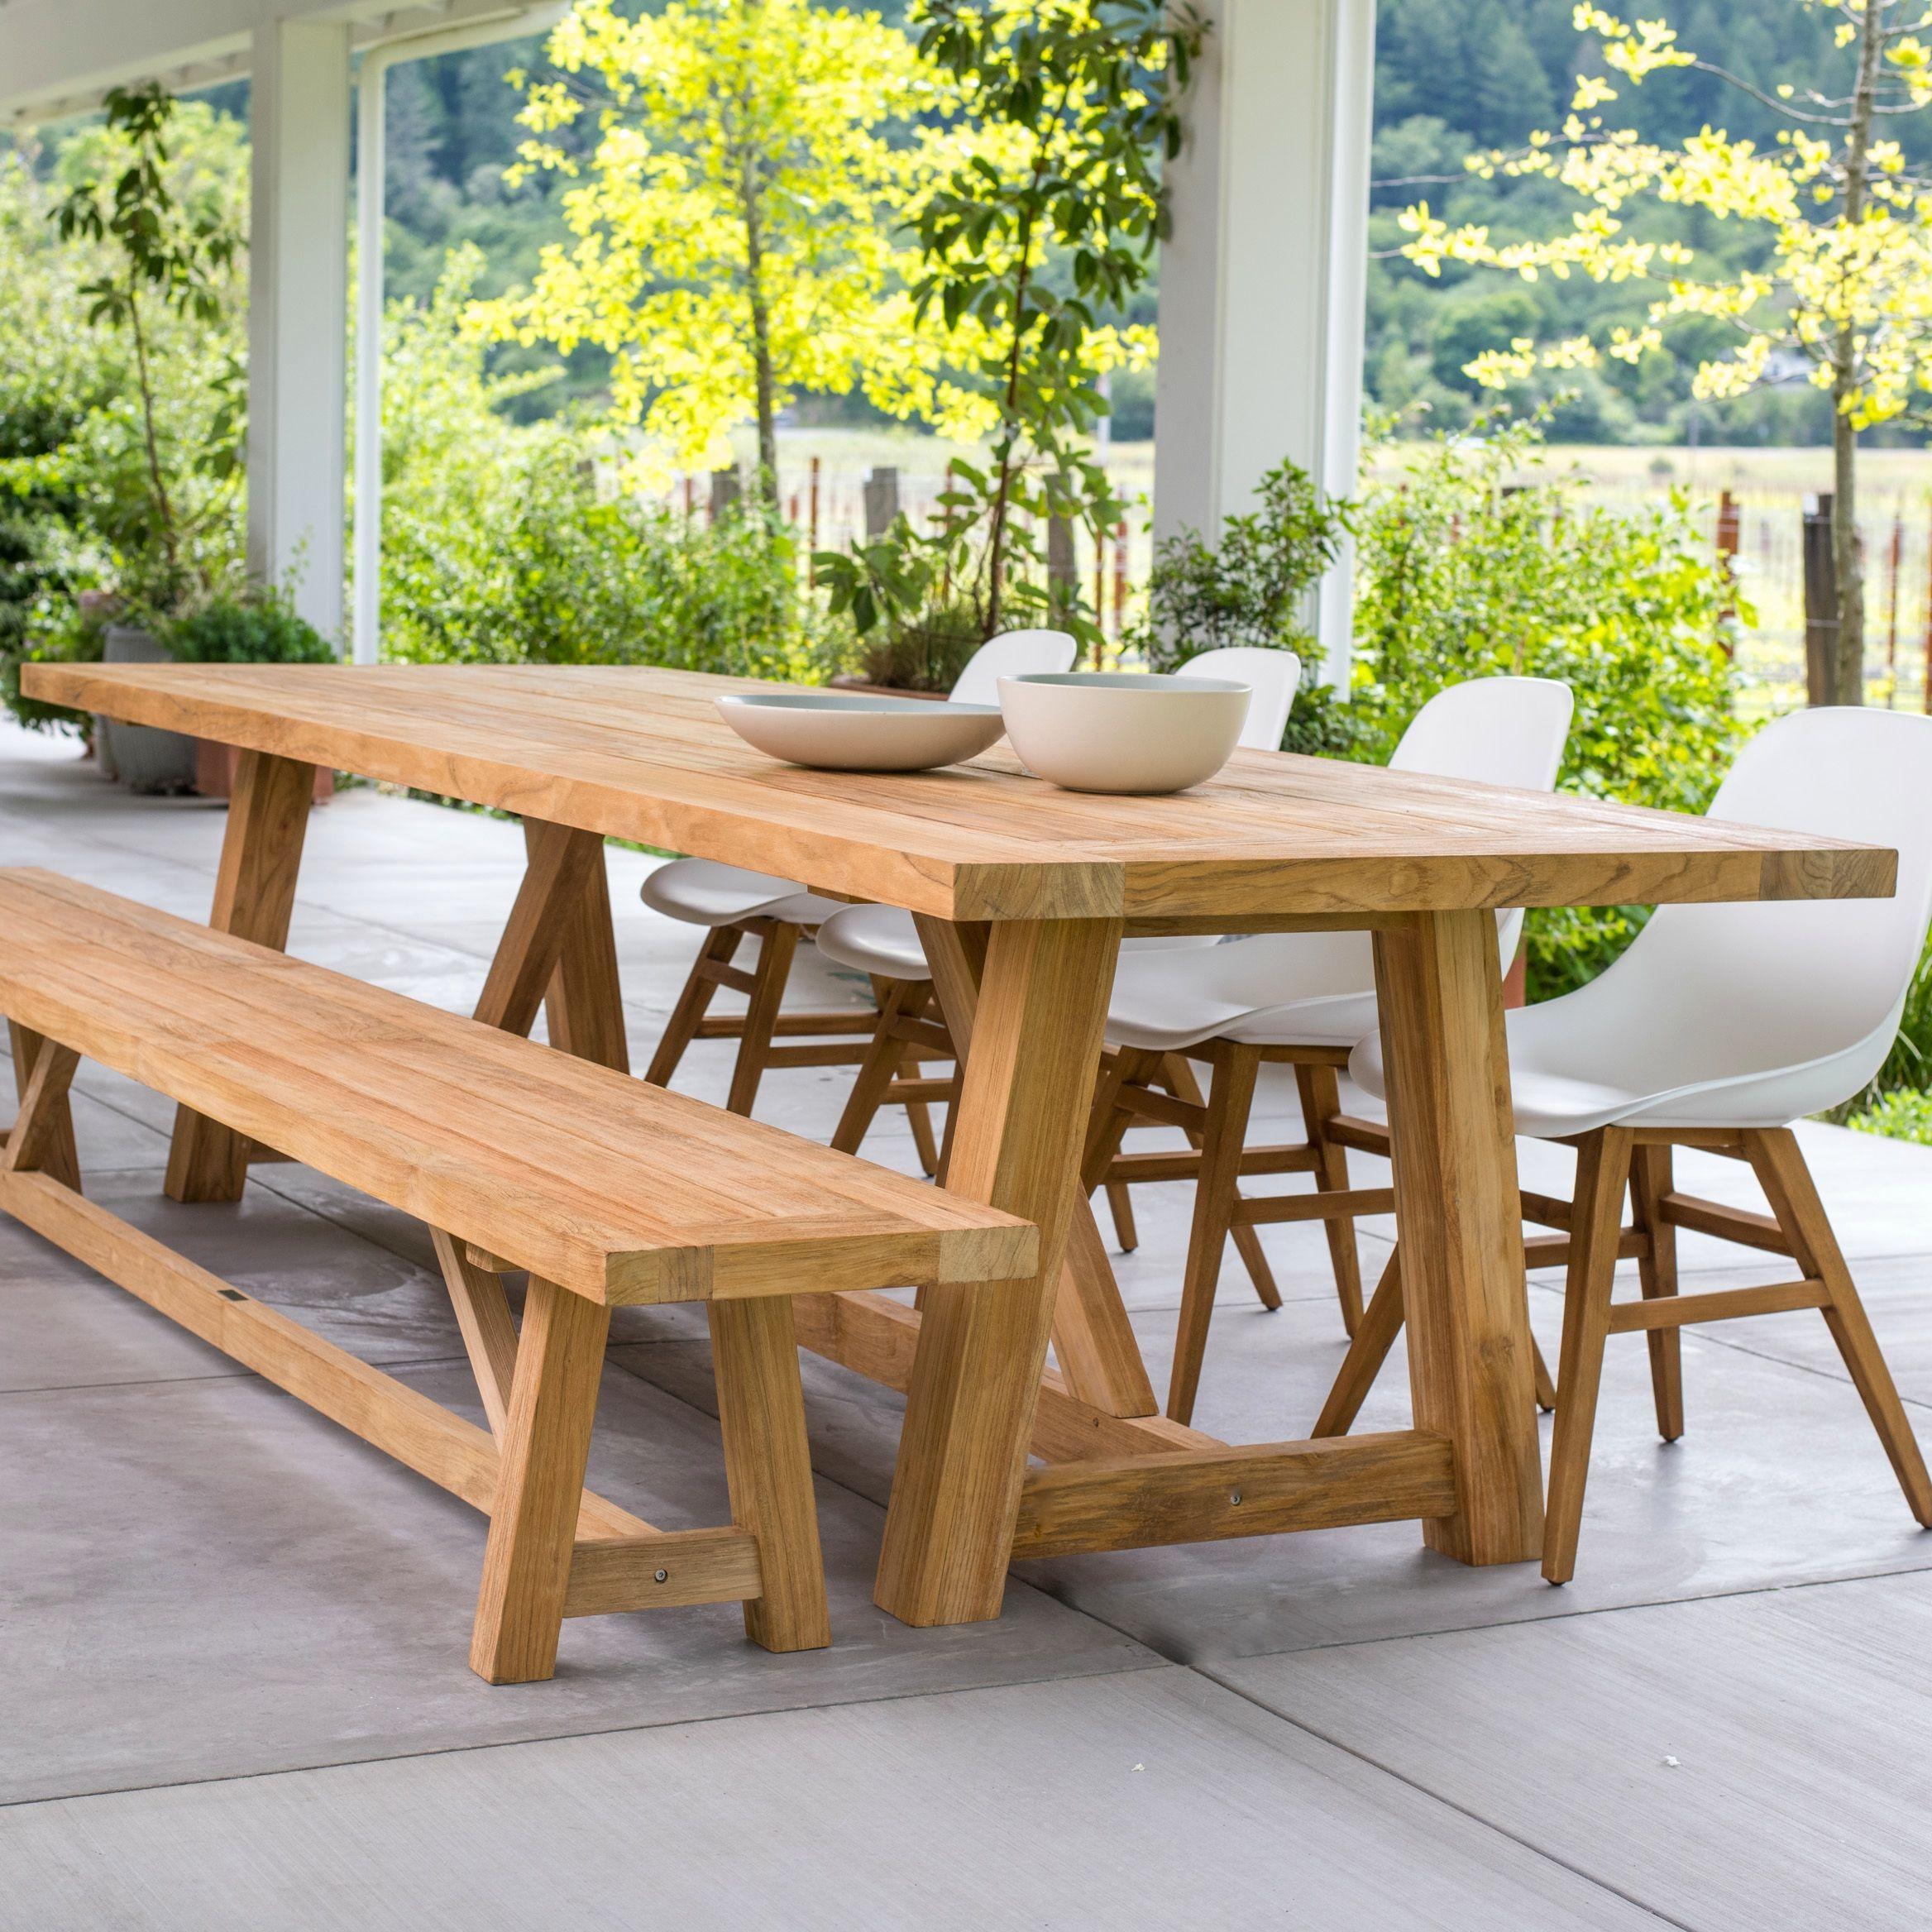 Renais Beam Table - Teak Outdoor Furniture | Terra Patio